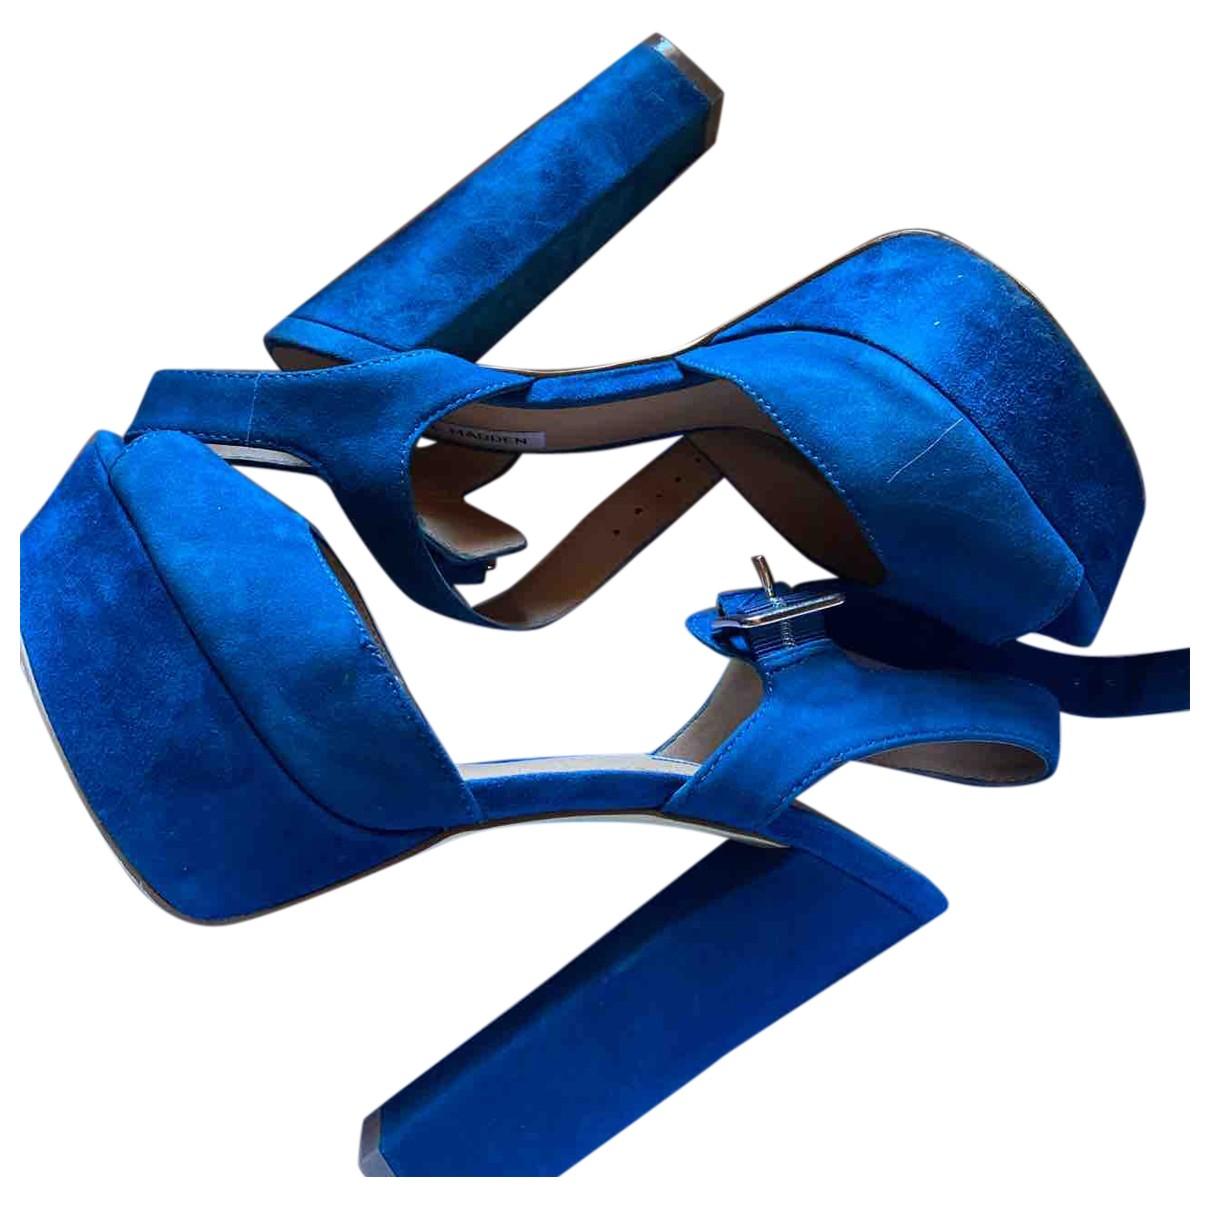 Steve Madden N Blue Suede Heels for Women 9 UK